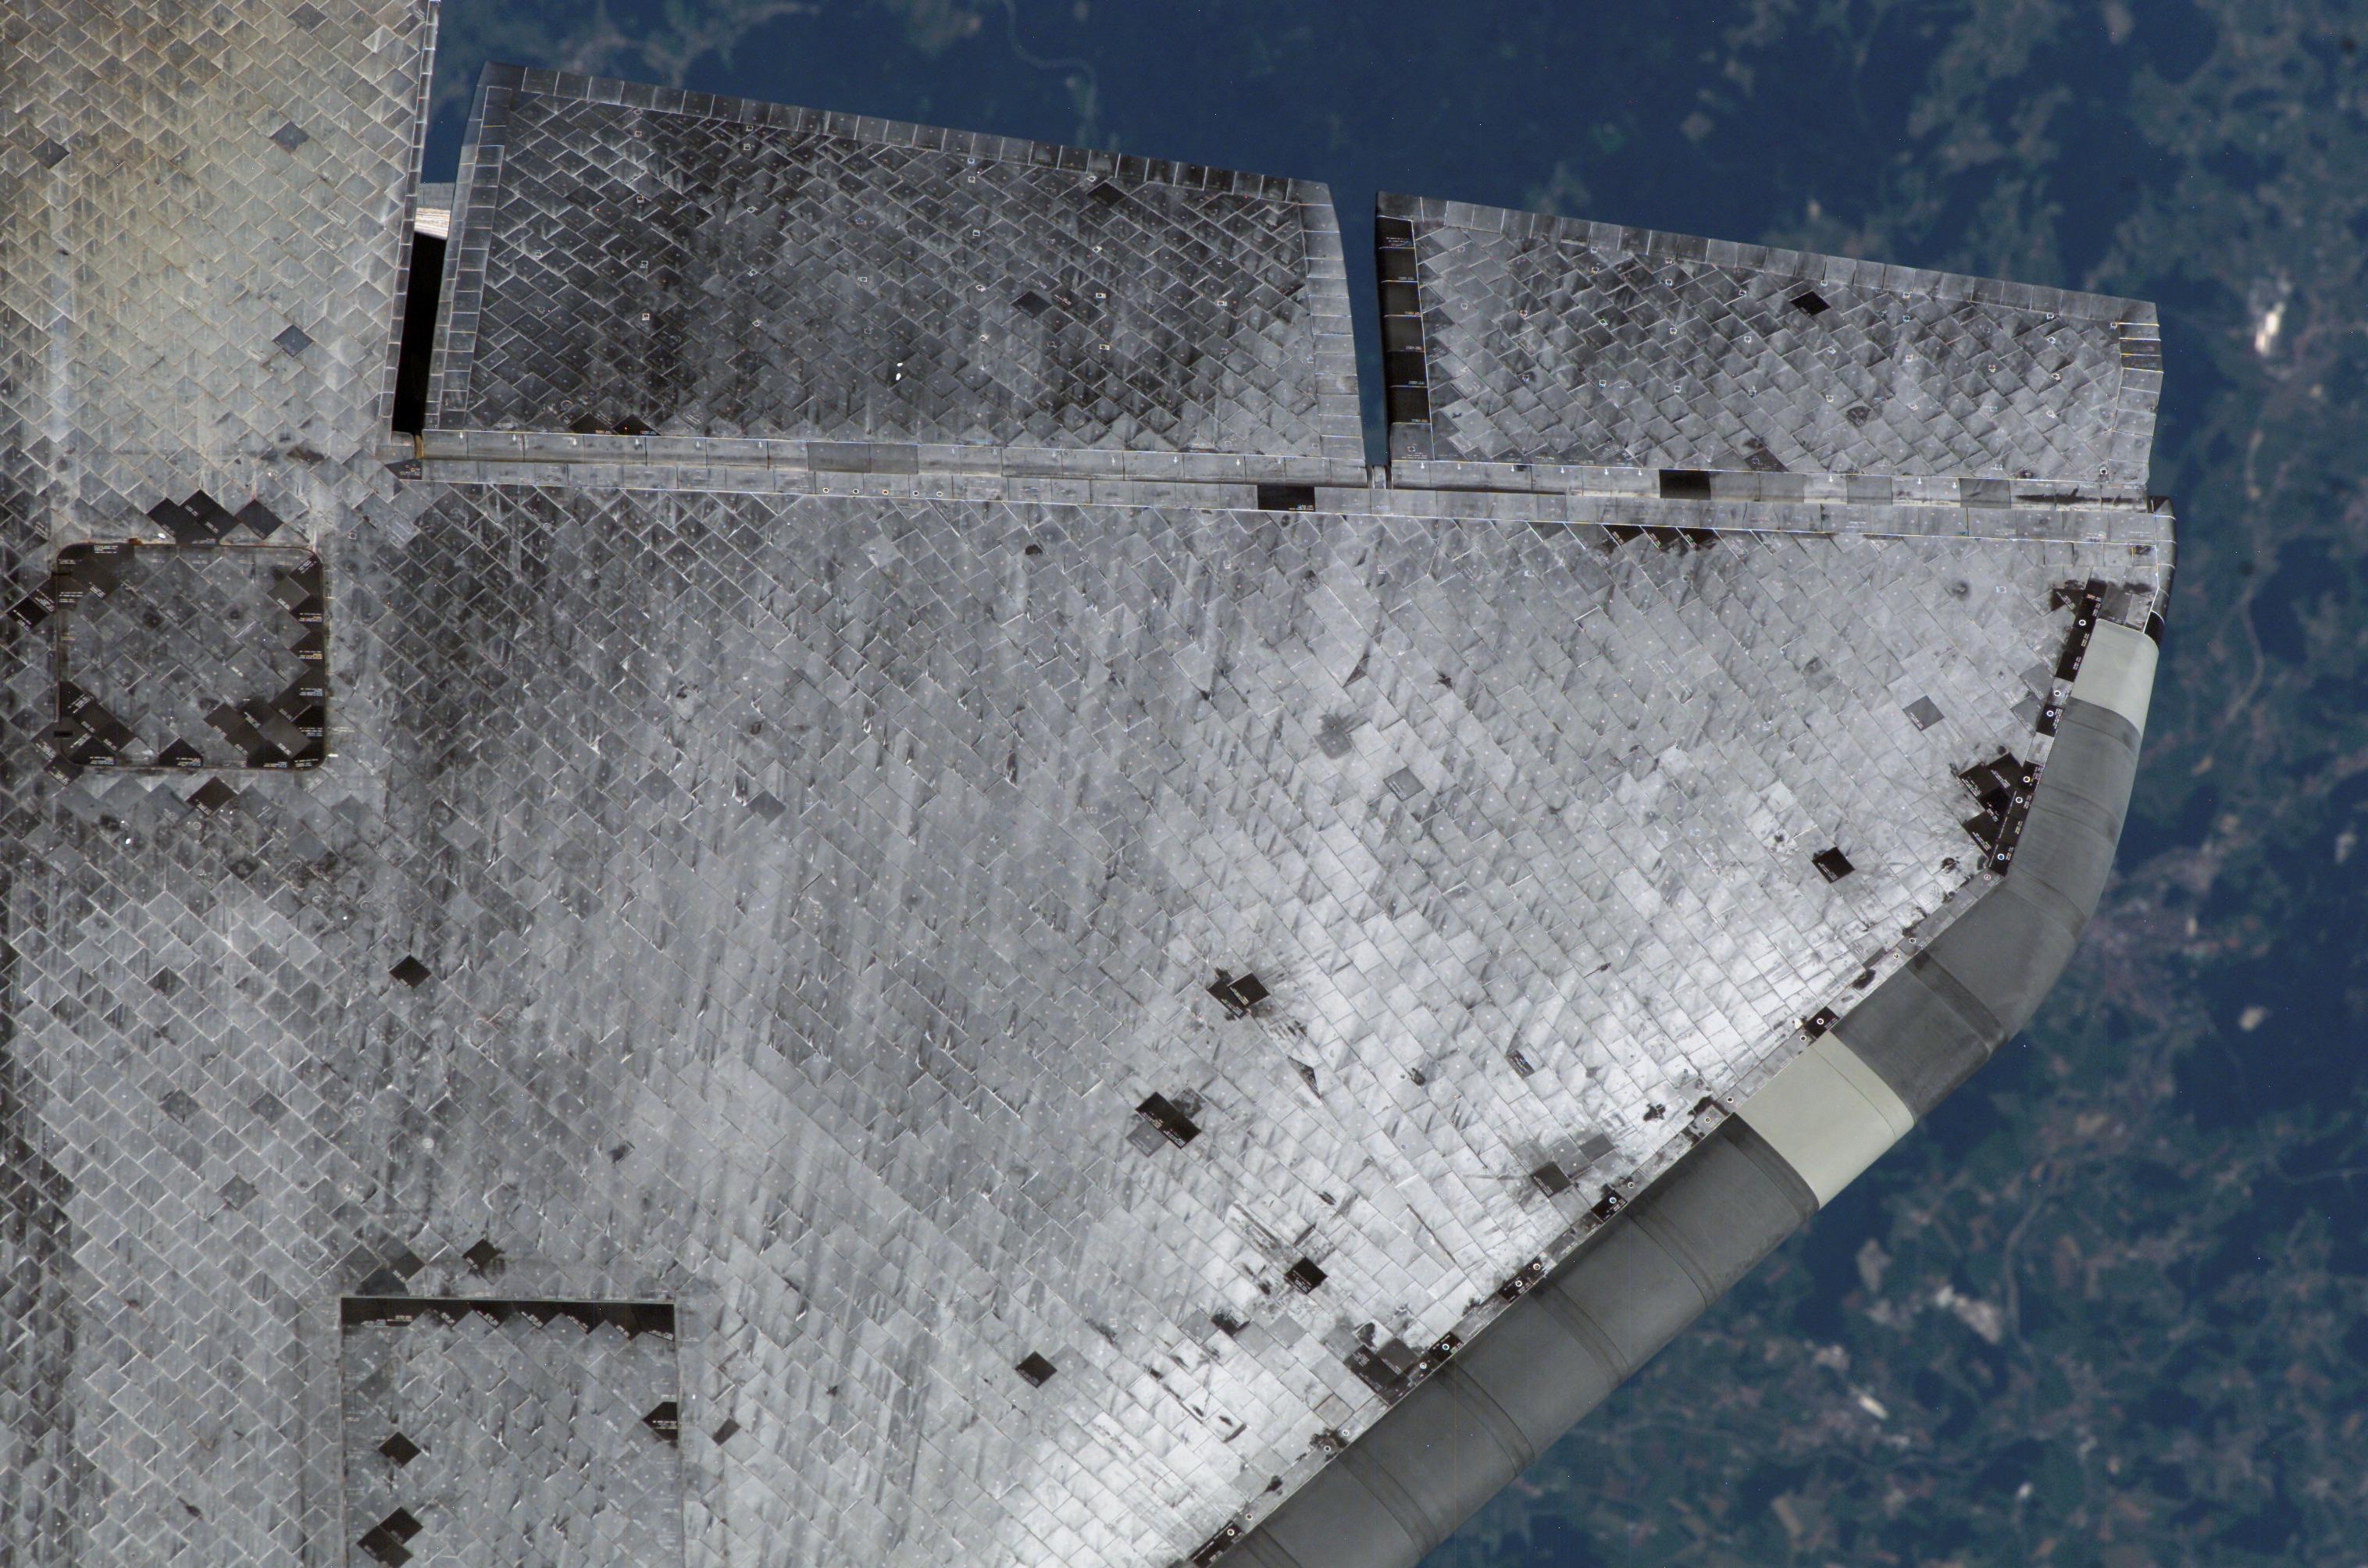 space shuttle tile glue - photo #8